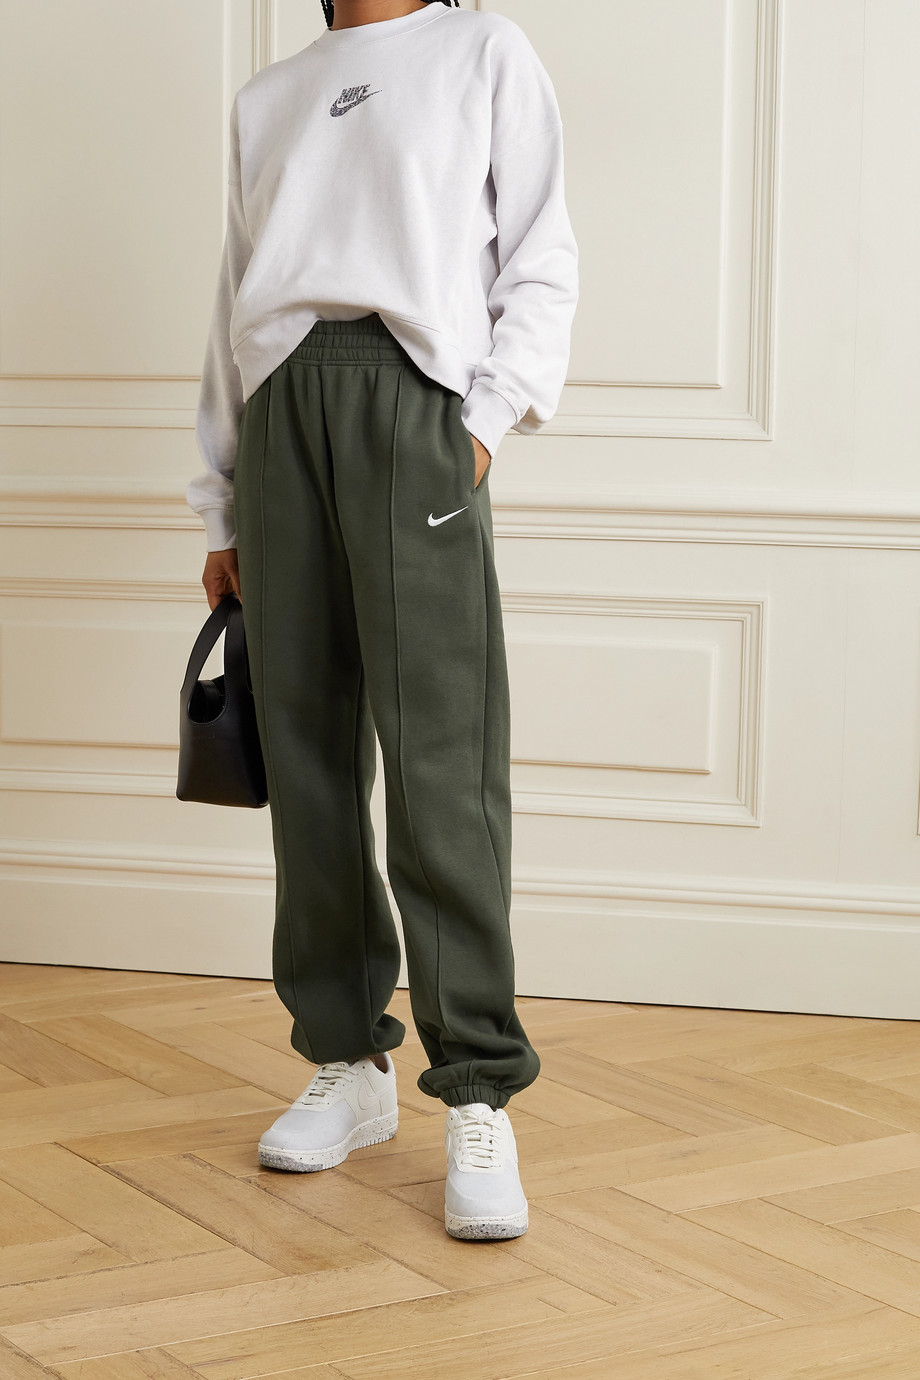 Nike Sportswear cotton-blend jersey track pants